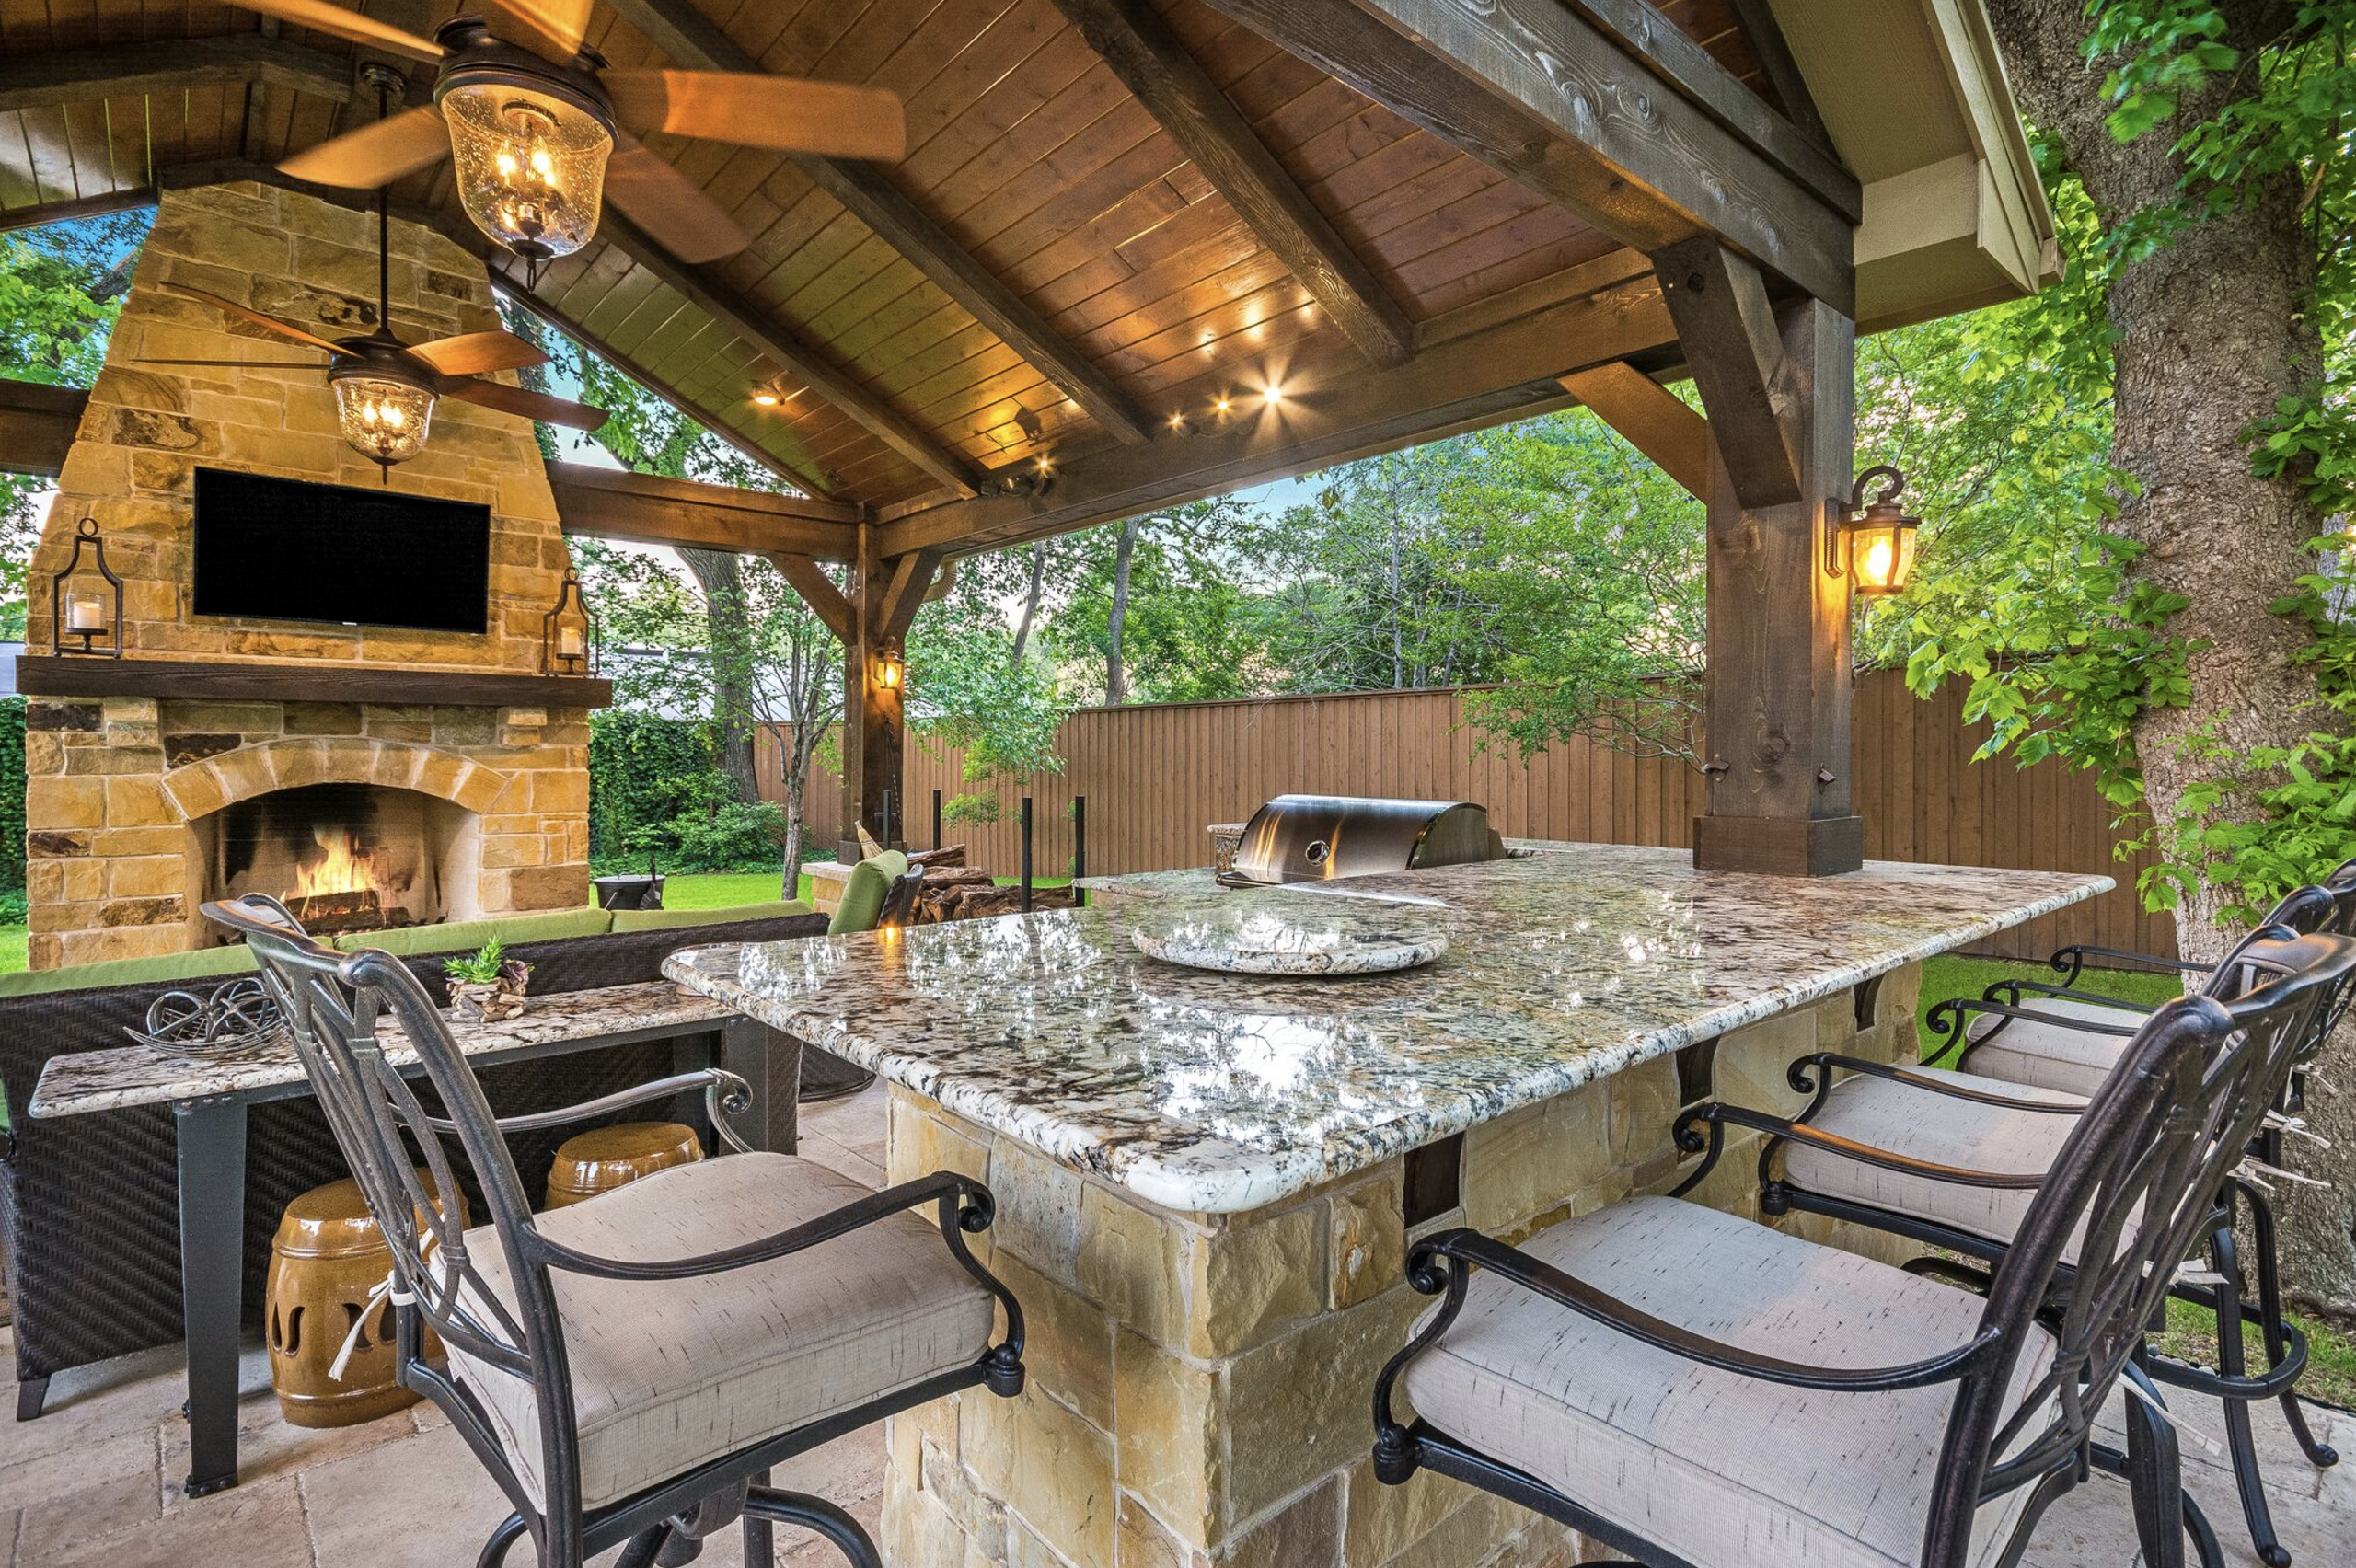 Stunning Outdoor Living Space By Texas Custom Patios Patio Patio Design Backyard Patio Designs